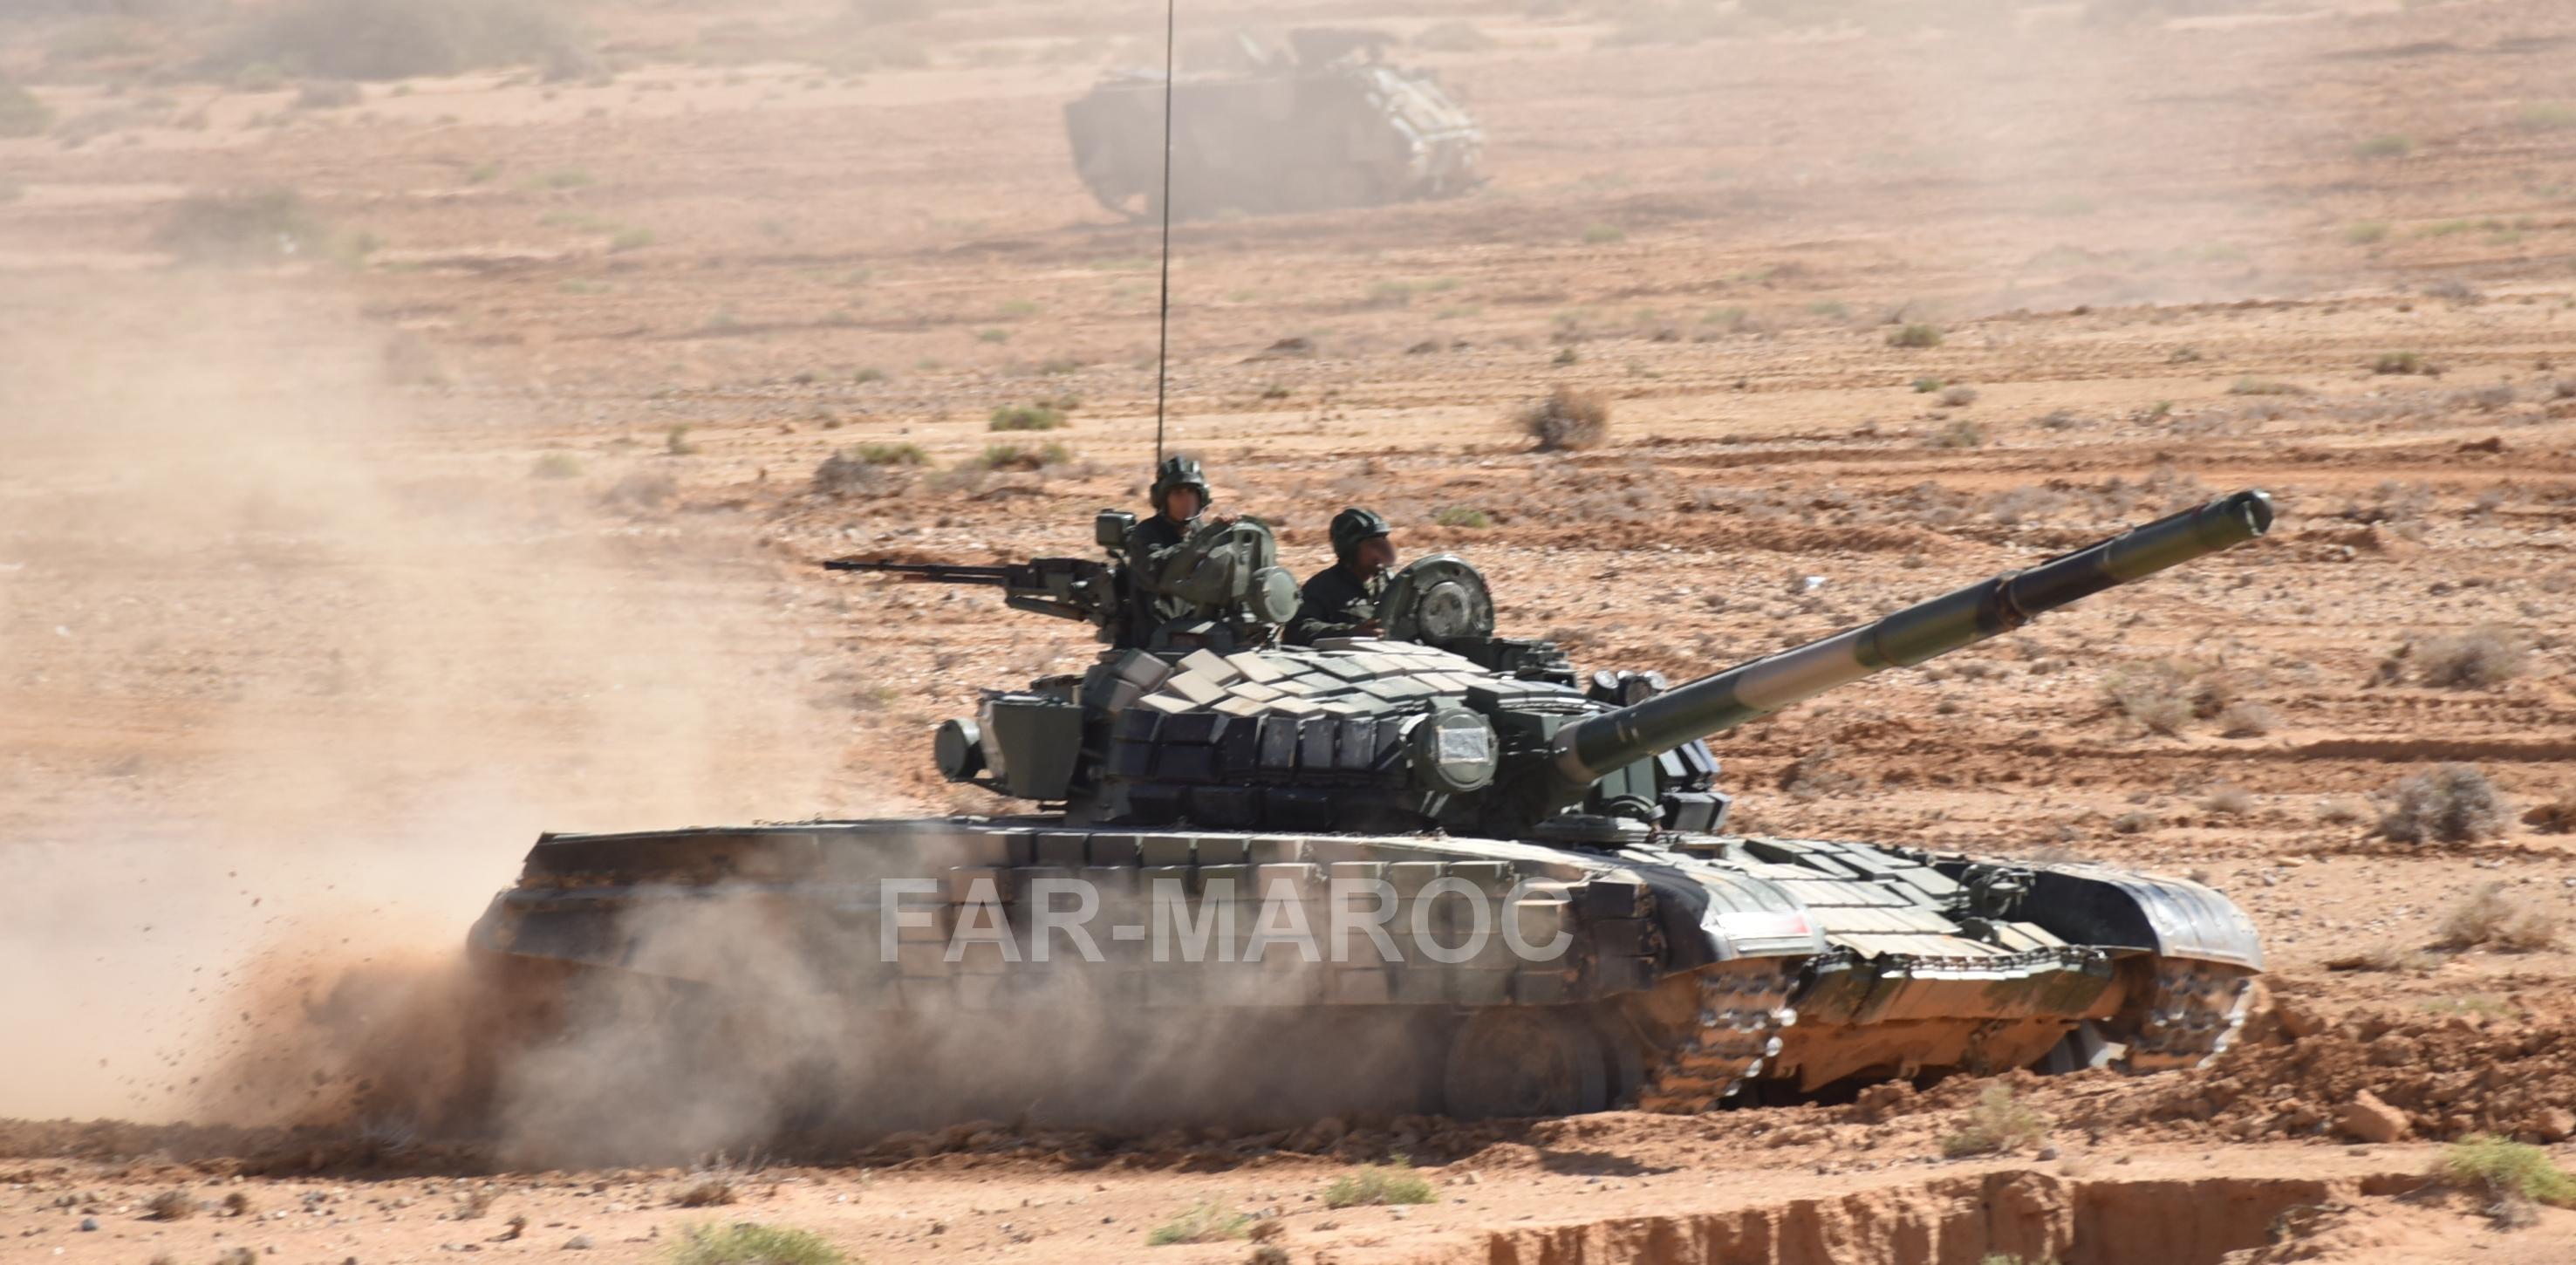 Chars T-72B/BK MArocains // Moroccan Army T-72B/BK Tanks - Page 6 49174125362_ec8a3da861_o